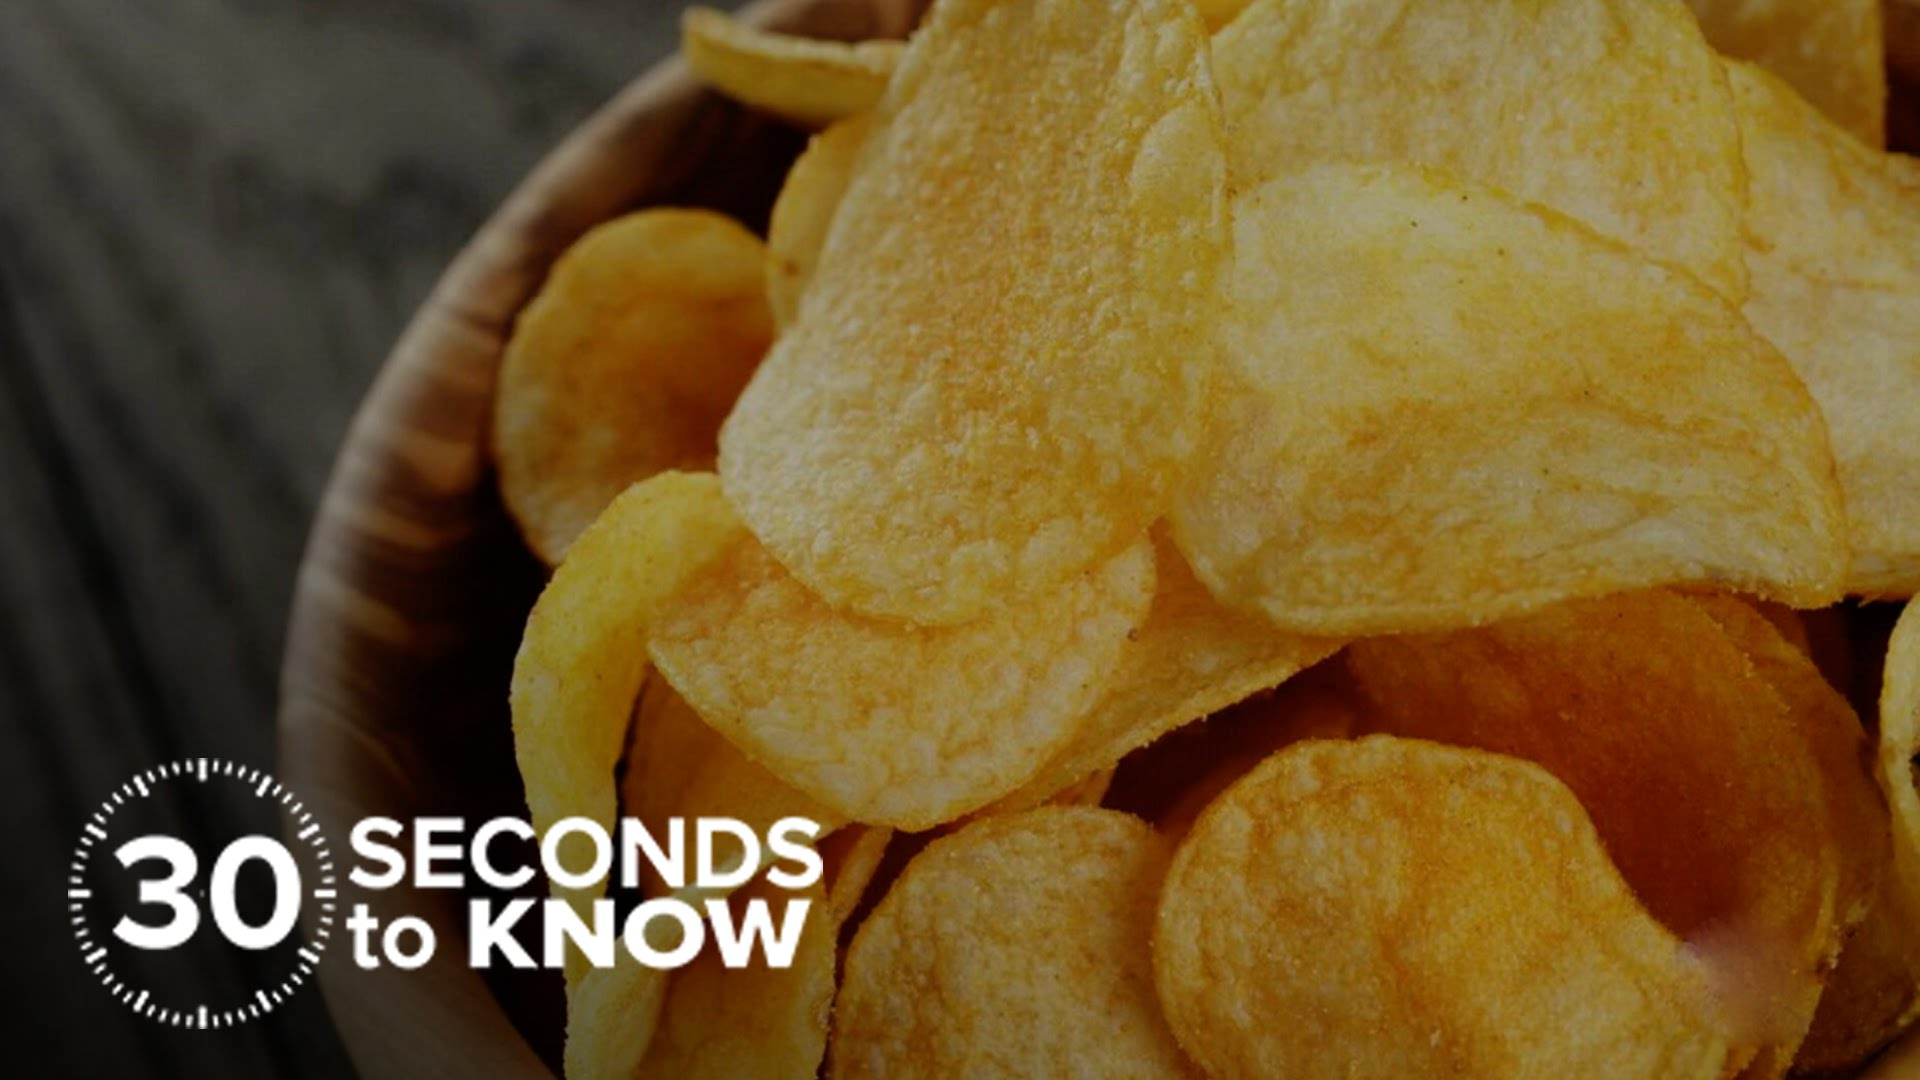 「三十秒讓你了解什麼是『反式脂肪』」- Why Are Trans Fats So Bad?